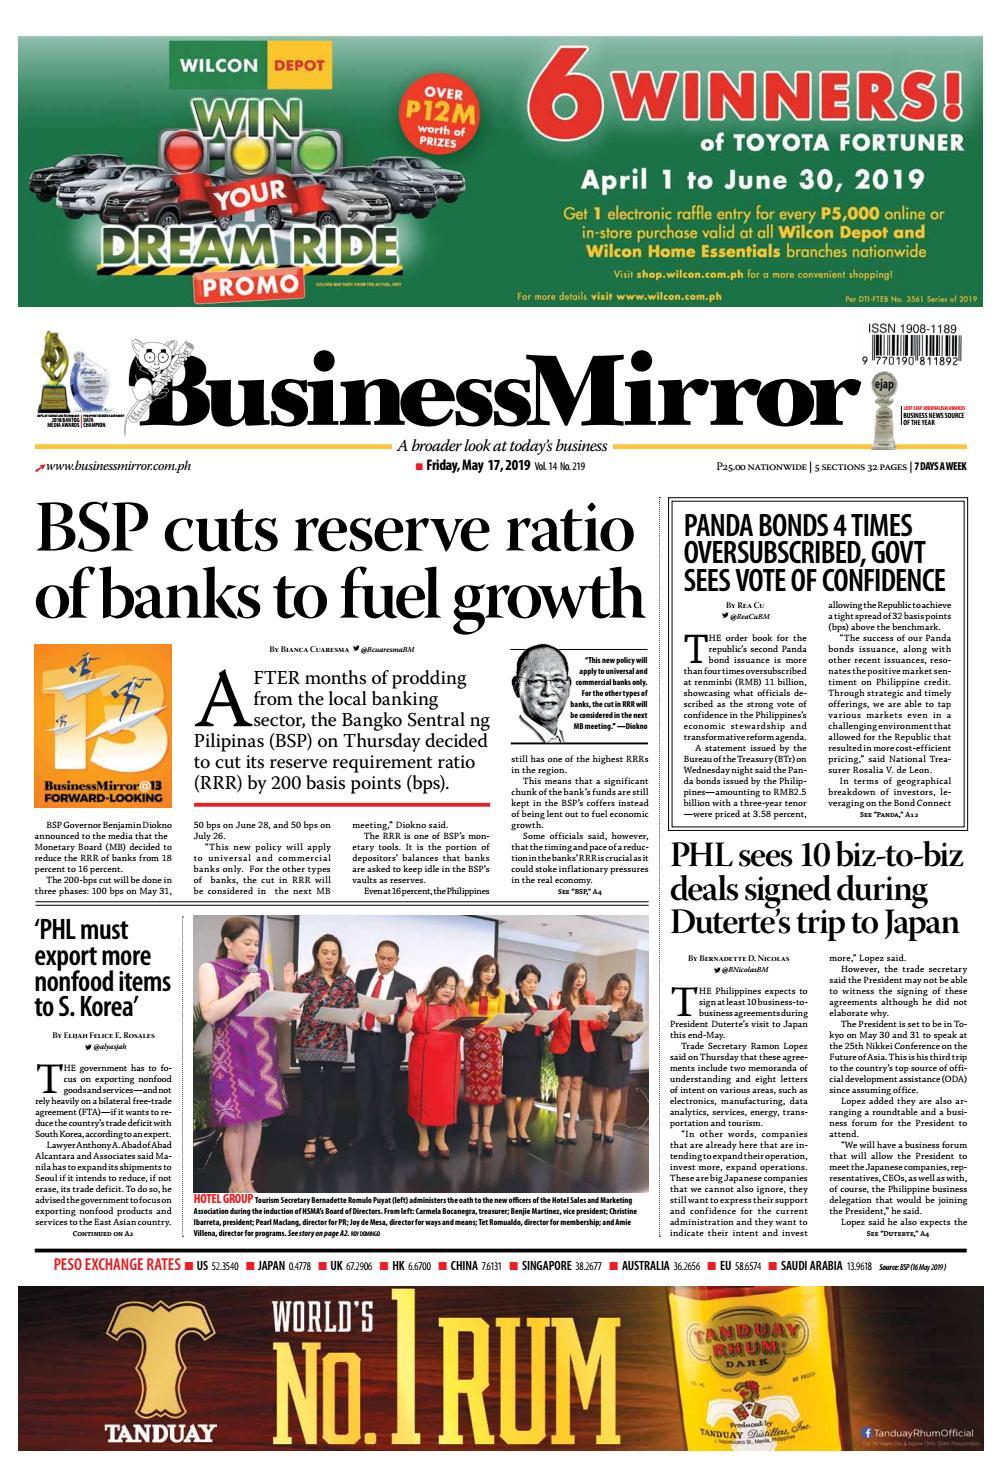 BusinessMirror May 17, 2019 by BusinessMirror - issuu